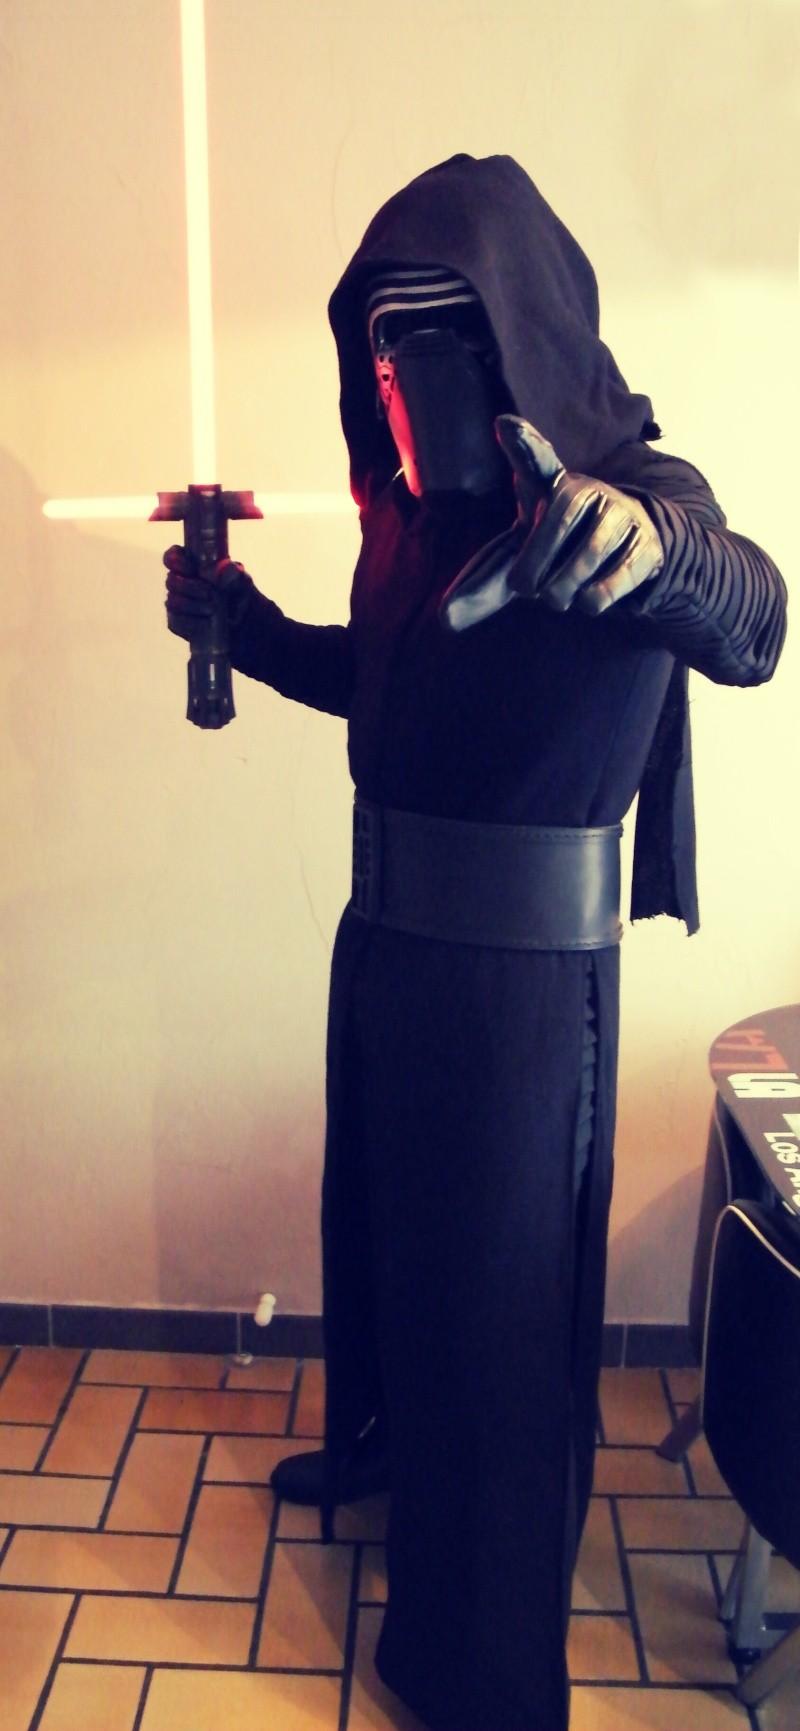 Kylo Ren cosplay The Force Awakens by Magik Photos11